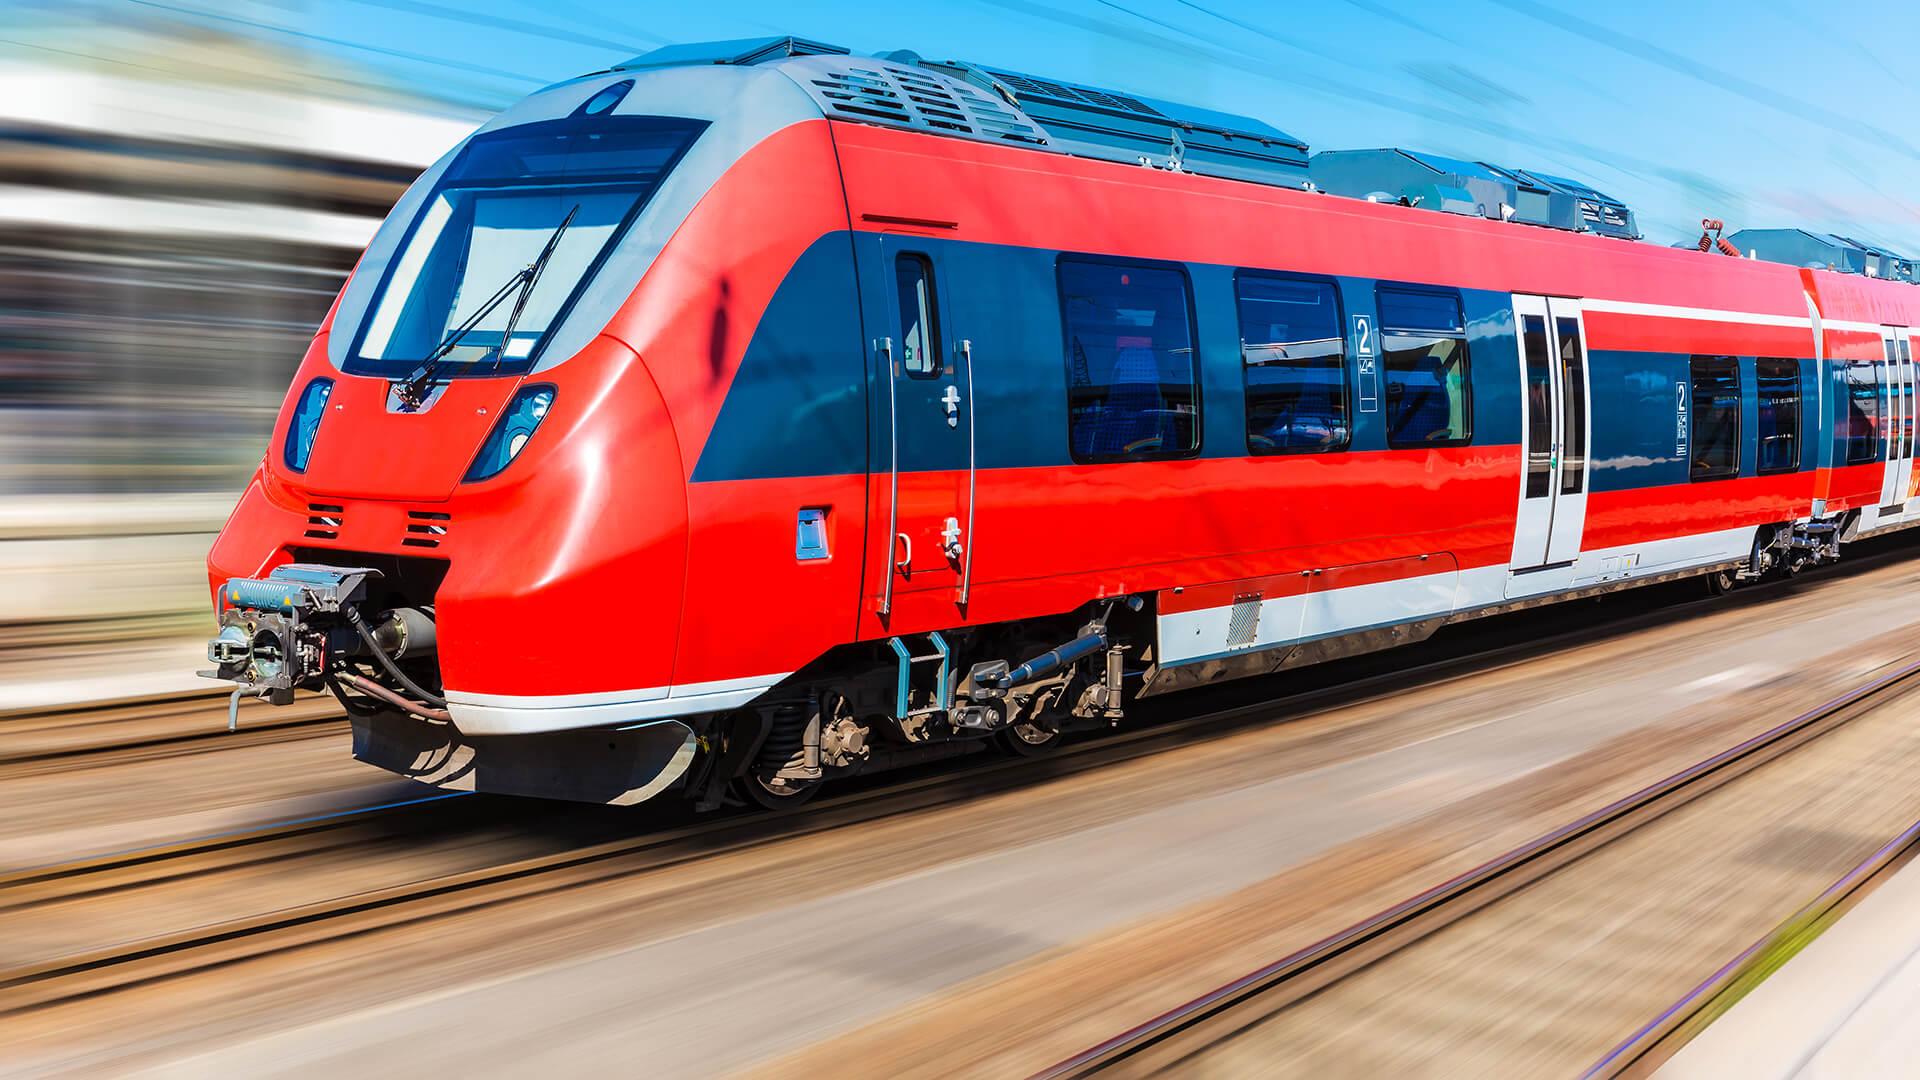 Fast train made with aluminium honeycomb